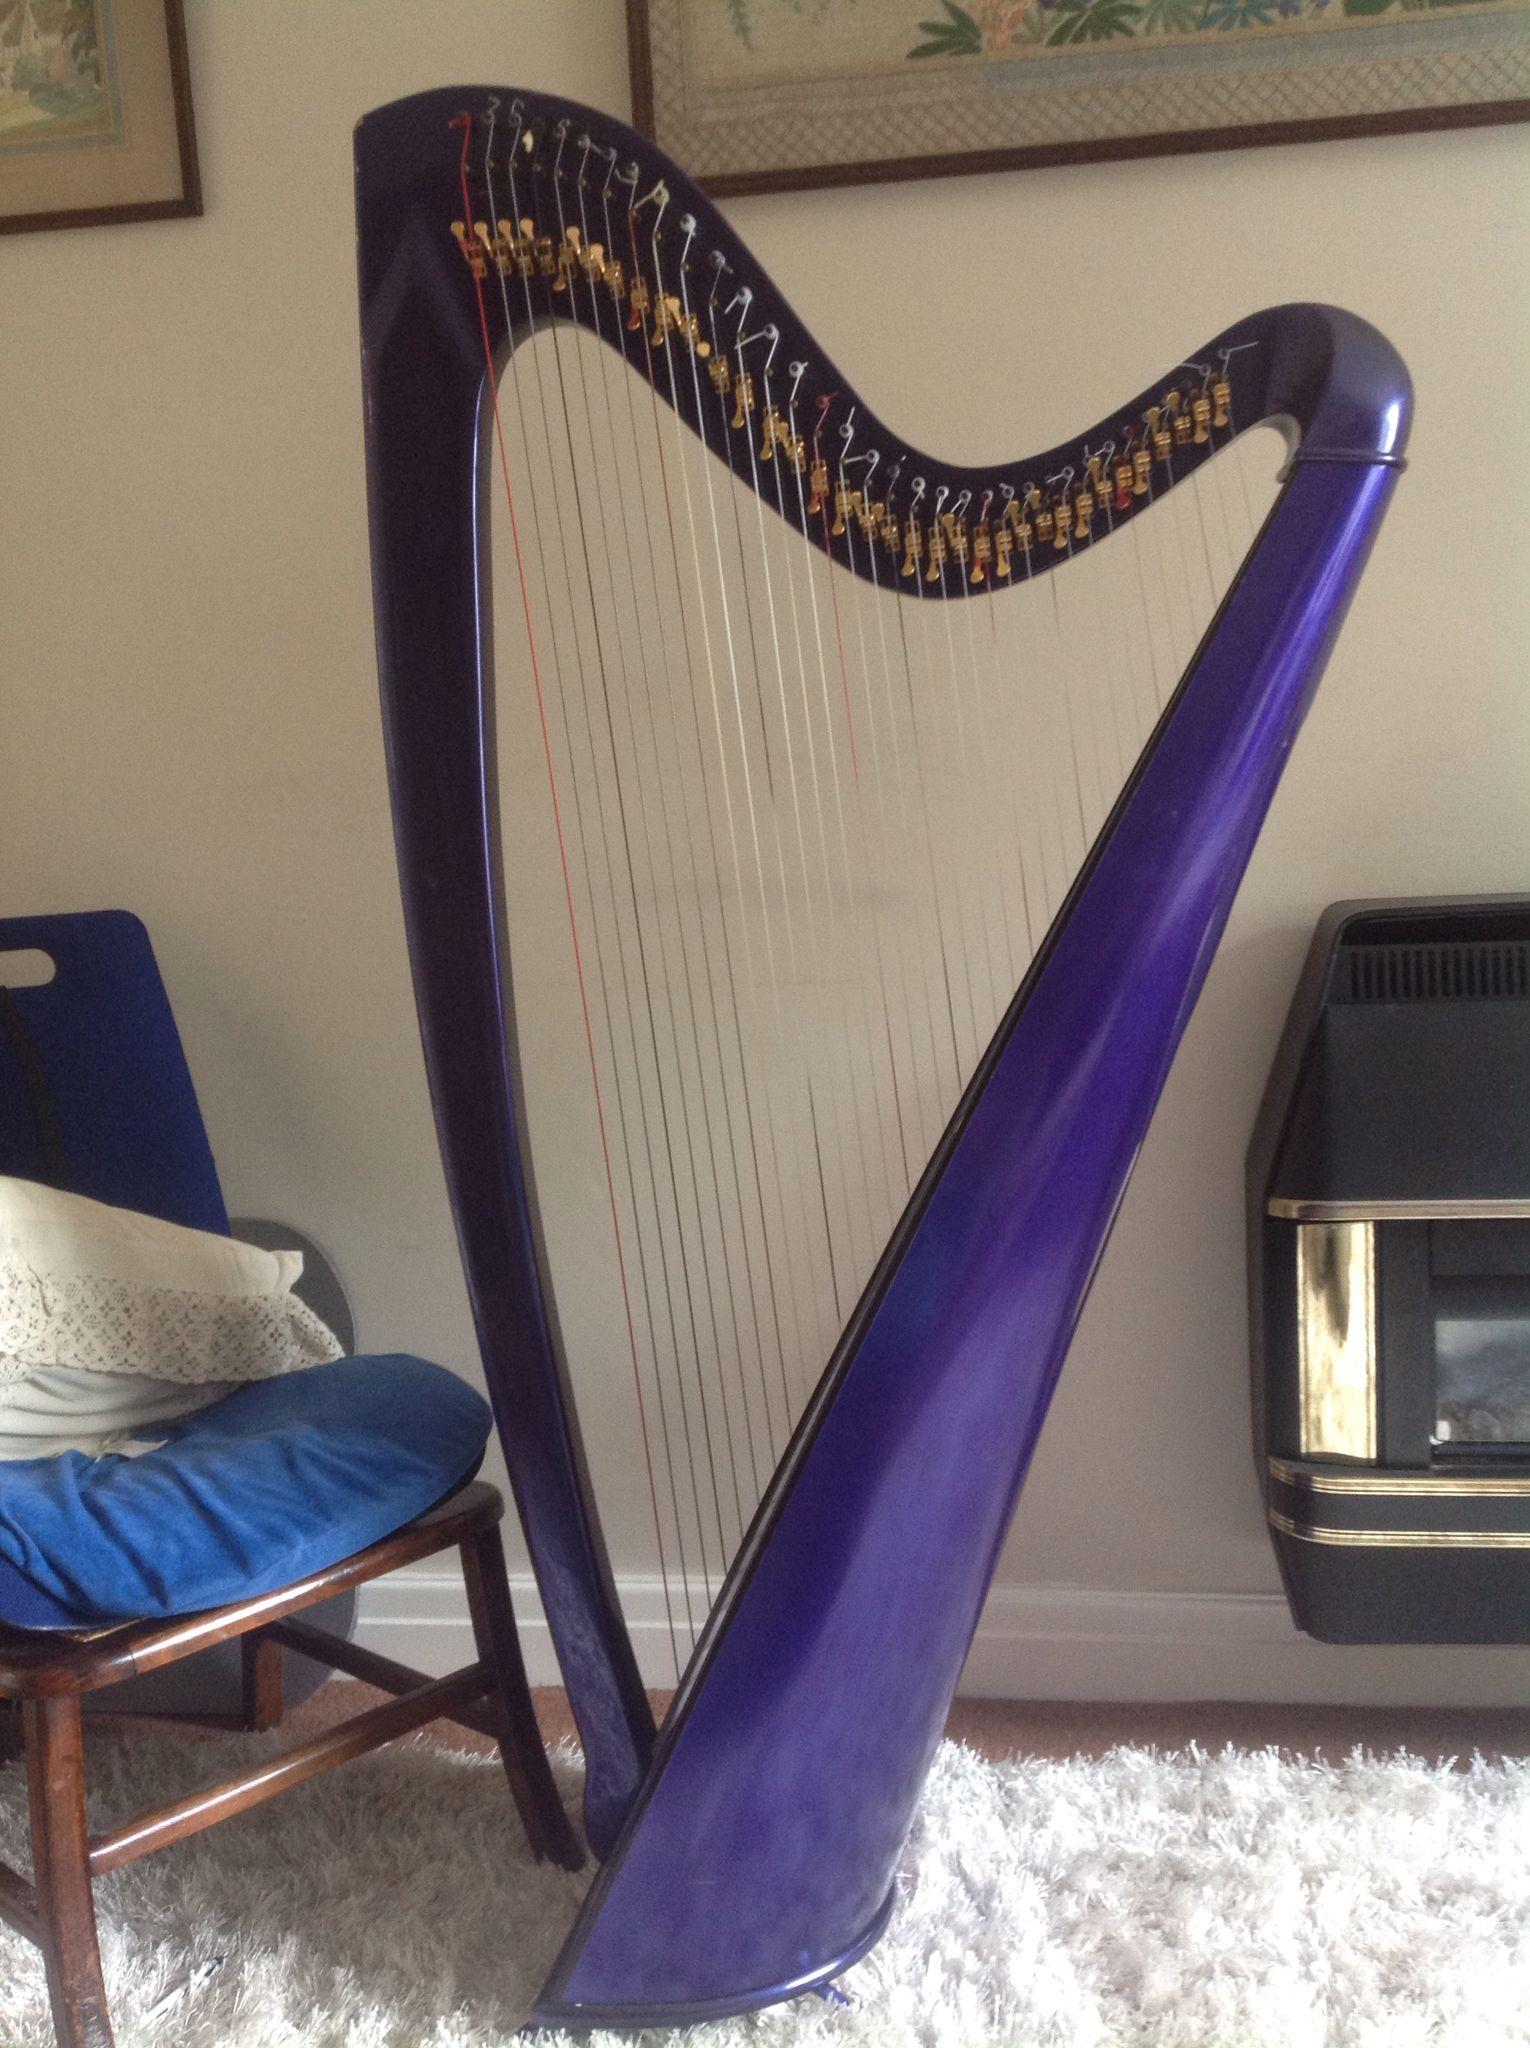 carbon fibre travel harp made by davy stewart new zealand musical instruments pinterest. Black Bedroom Furniture Sets. Home Design Ideas